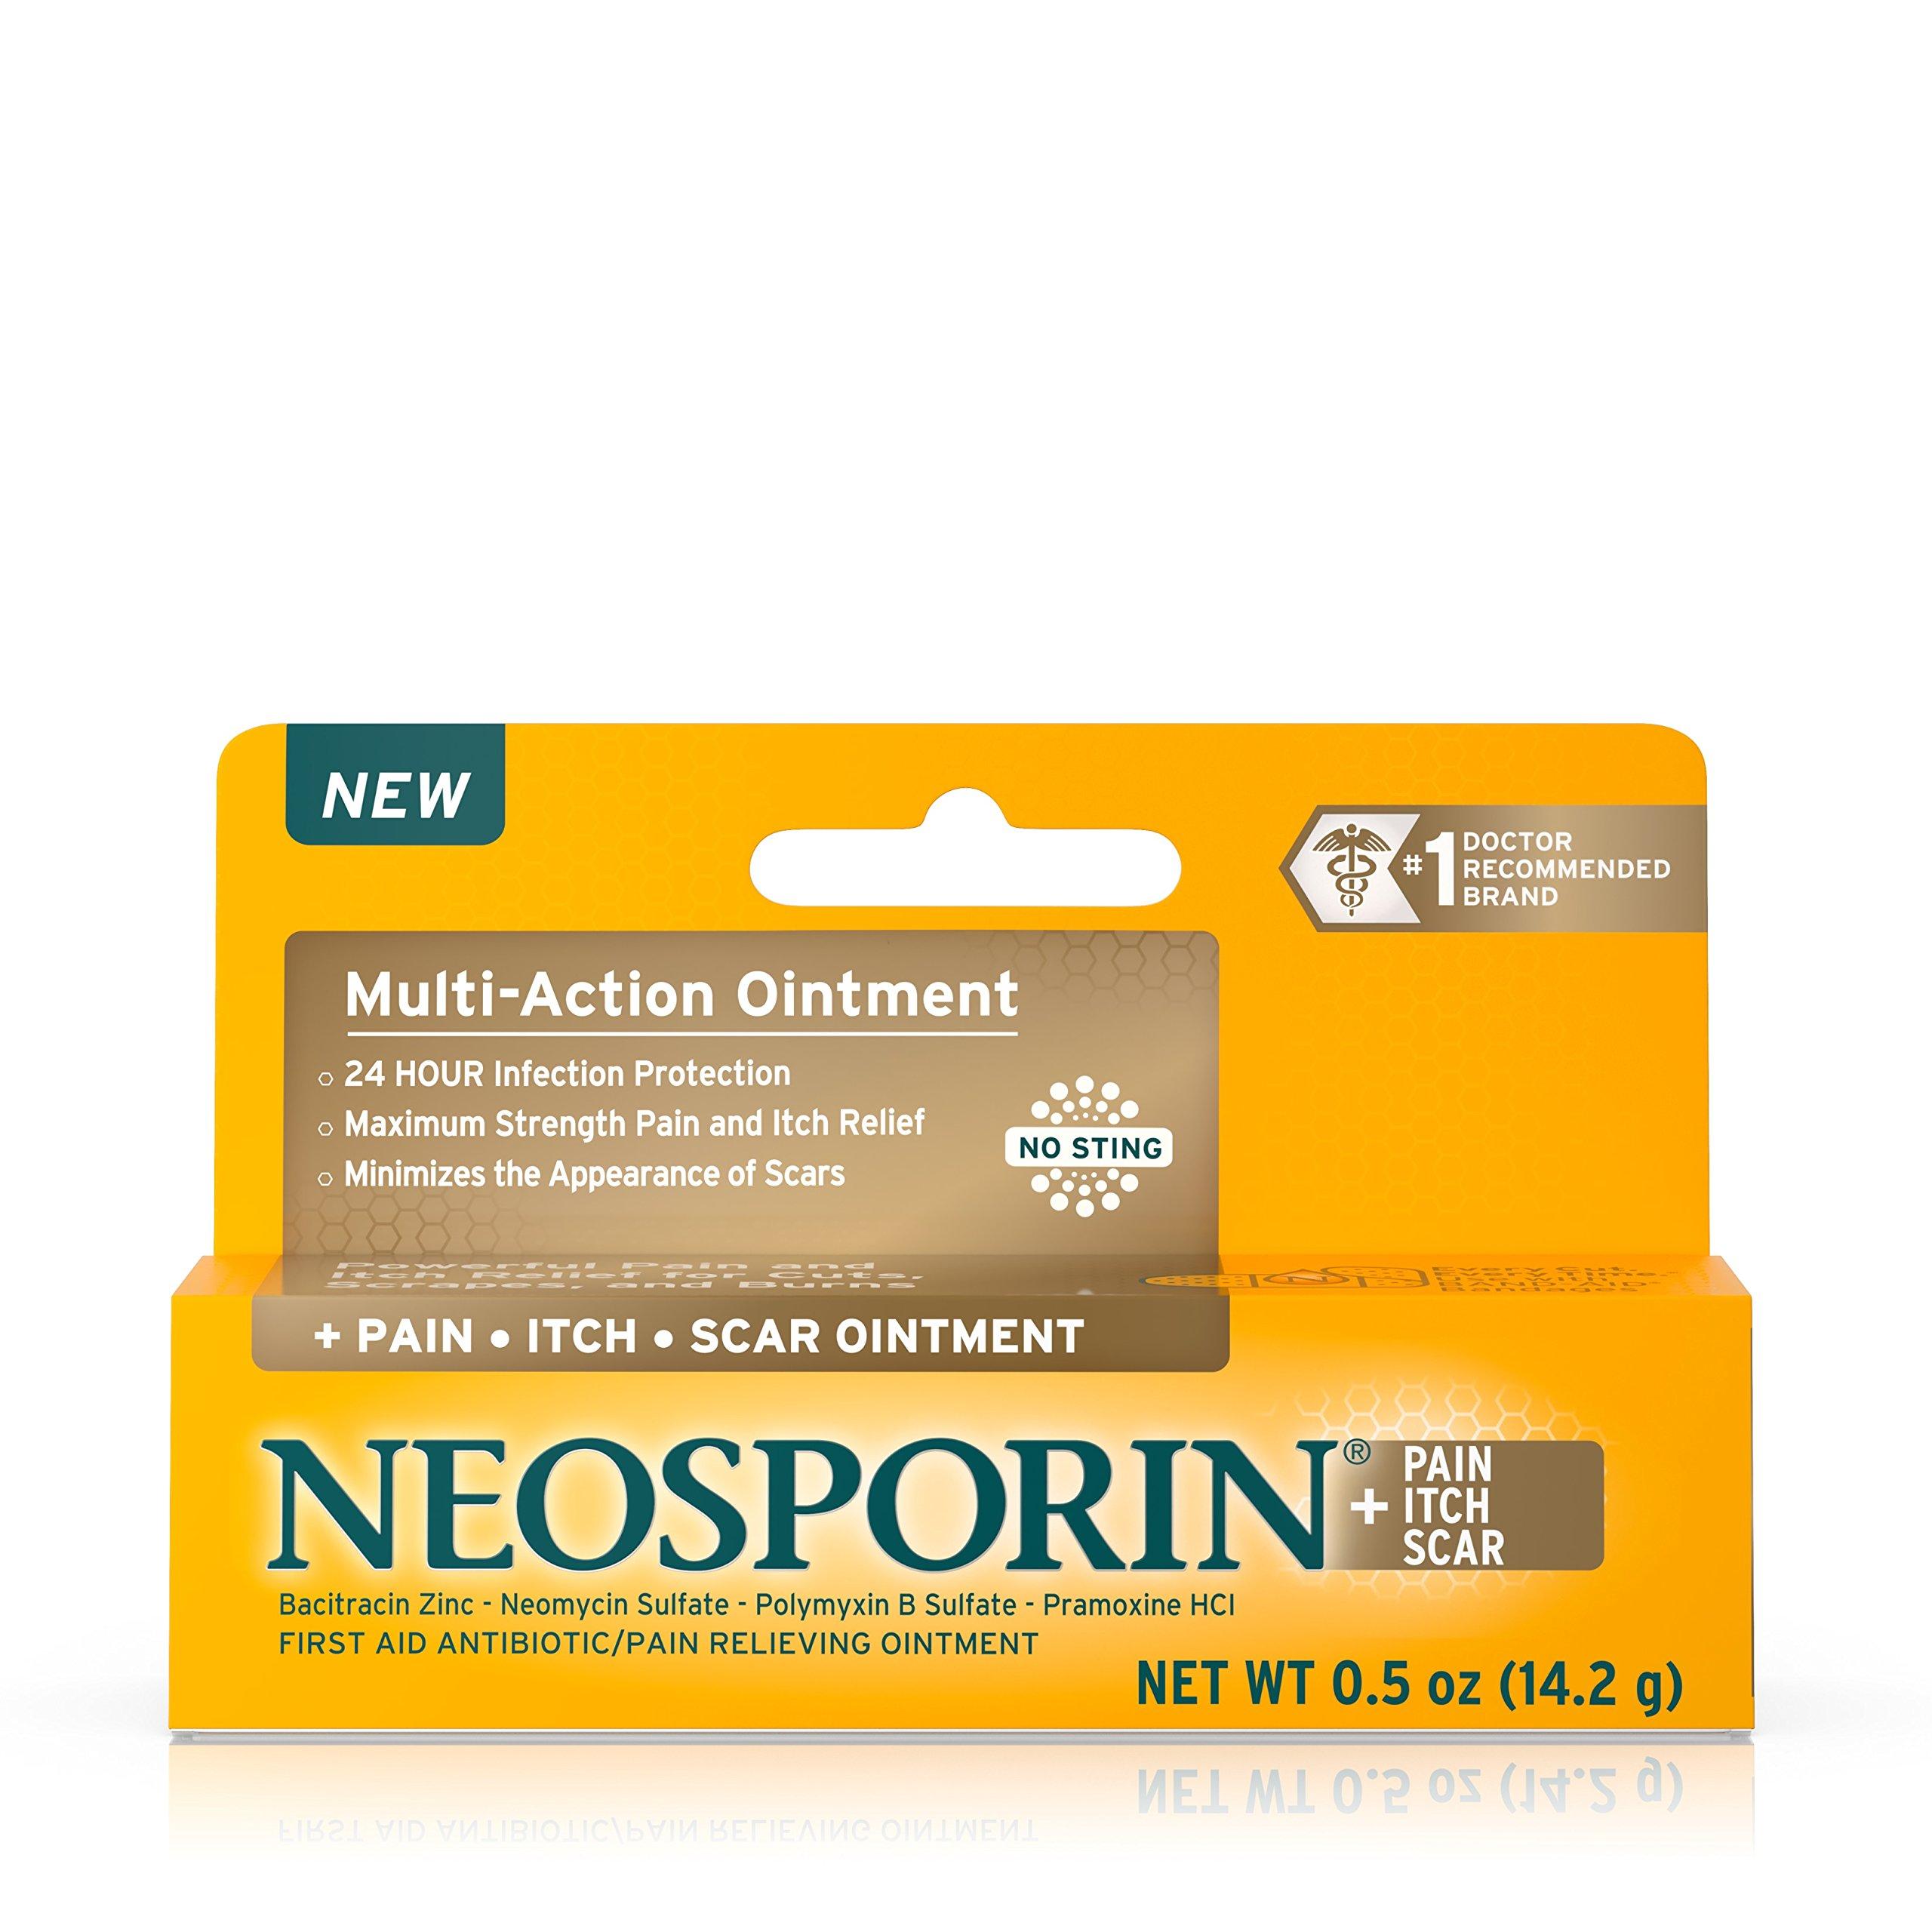 Neosporin + Pain, Itch, Scar Antibiotic Ointment, .5 Oz